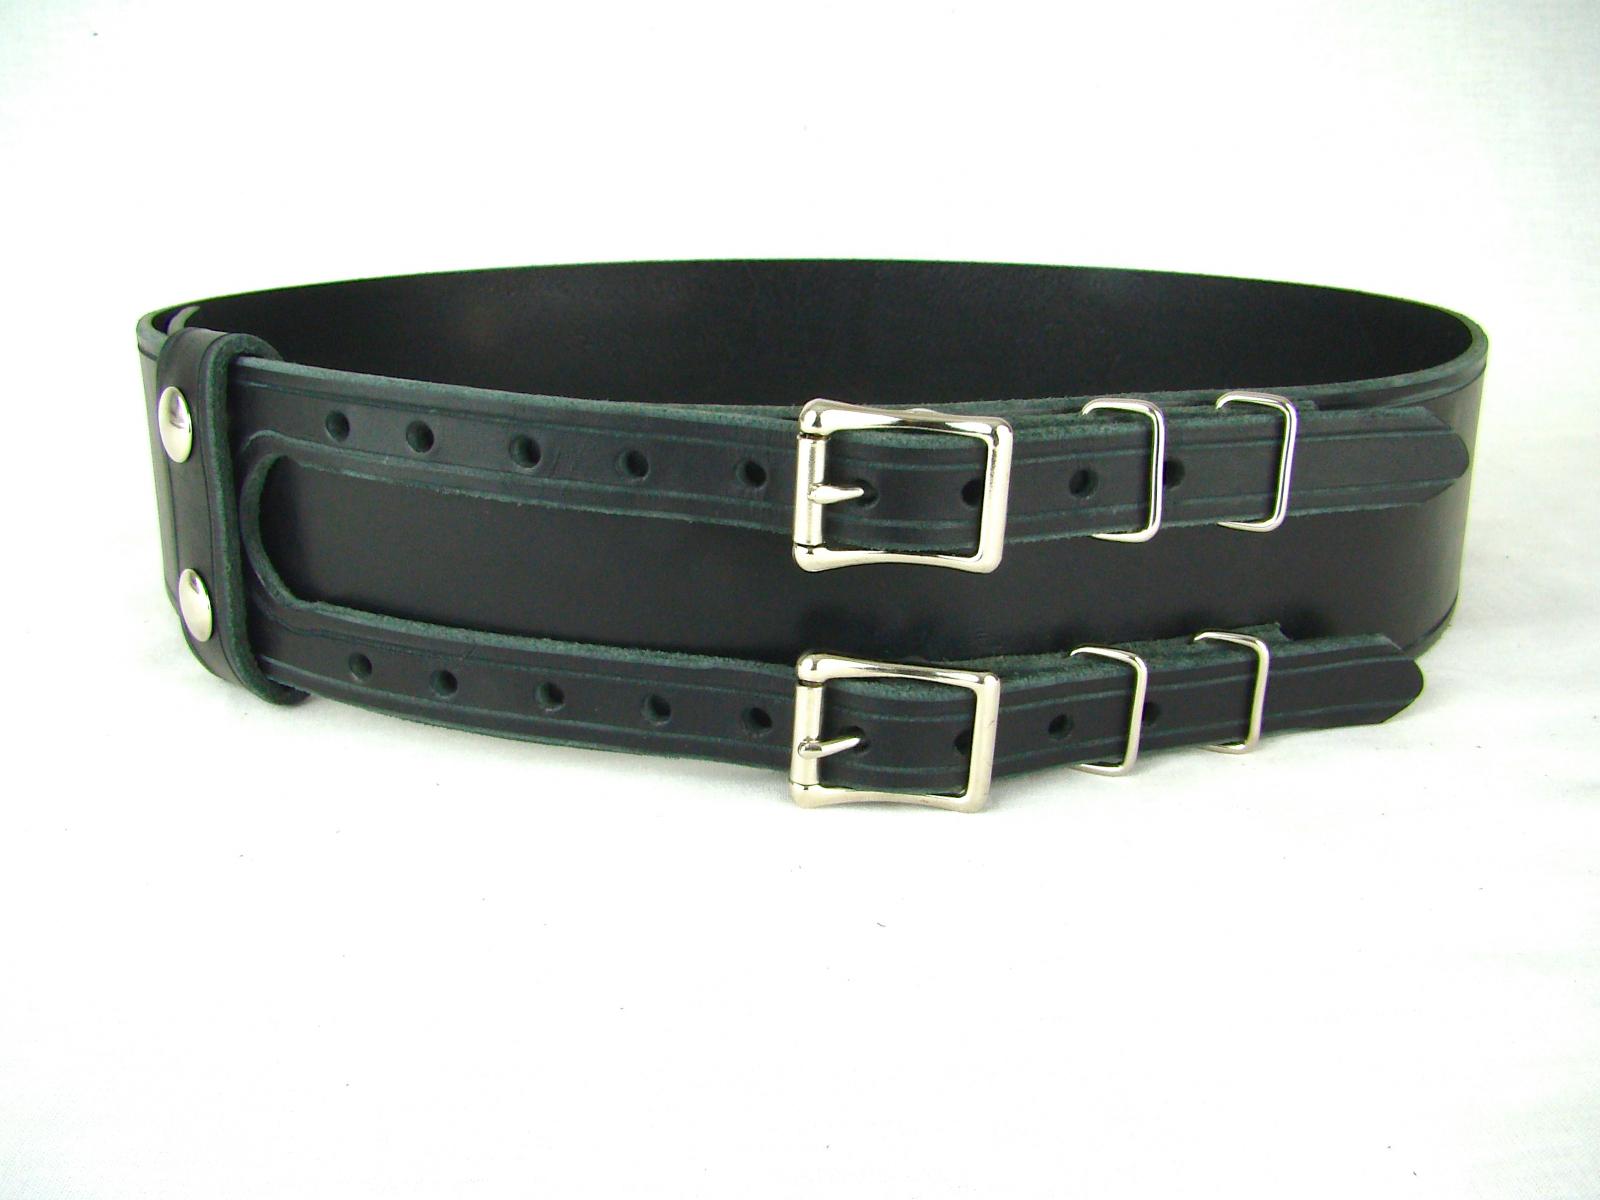 d5f3f979608b0 Kilt Belt Double Buckle Belt Black Leather Belt Basic Double Buckle Ki |  Holy Heck U.S.A.